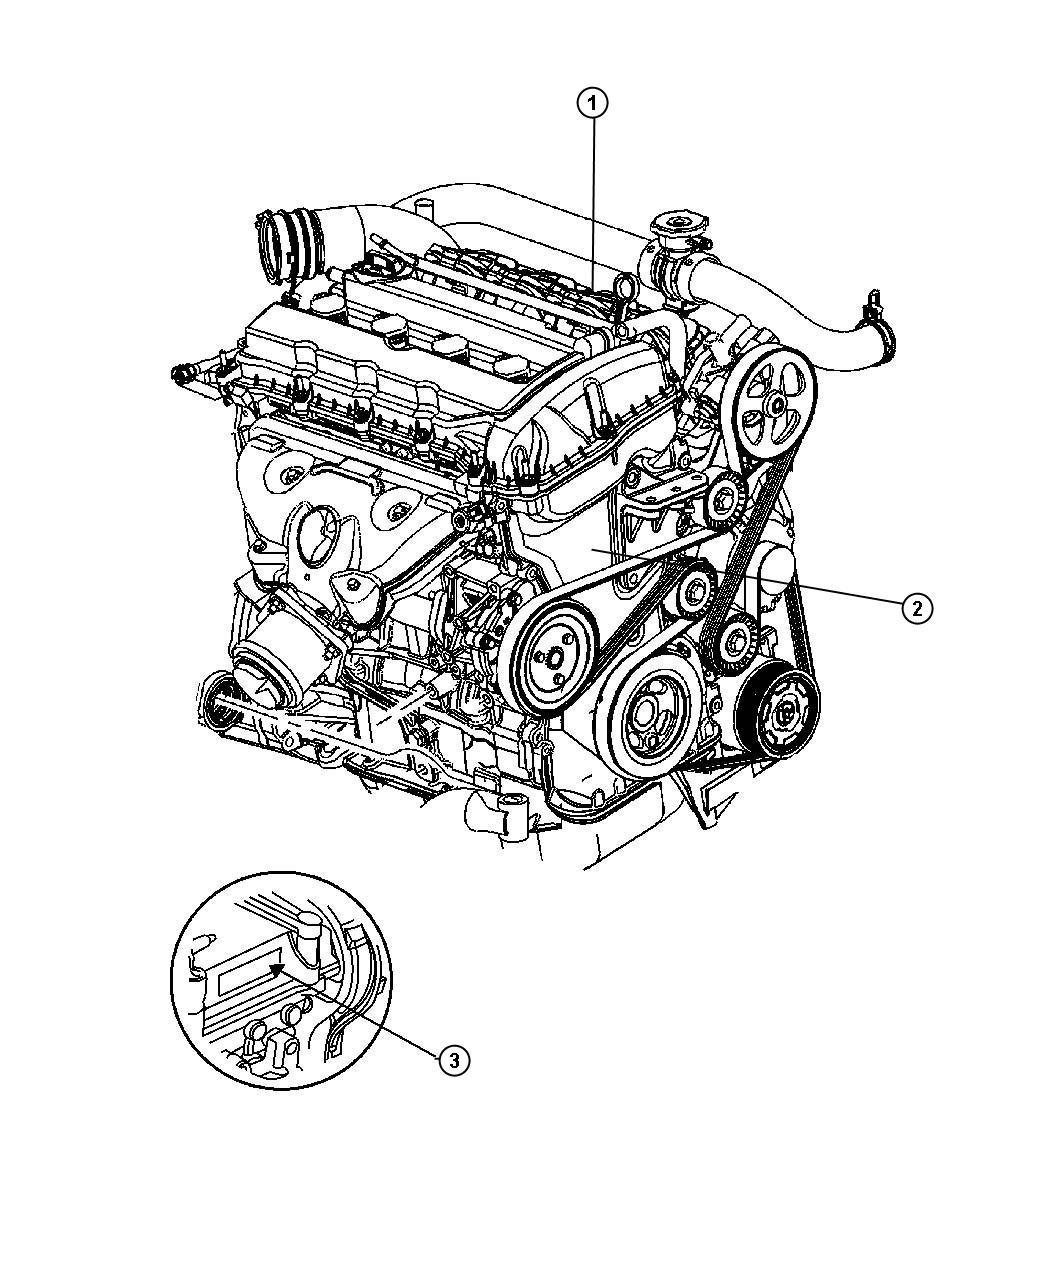 Jeep Patriot Engine. Long block. Remanufactured. [engine